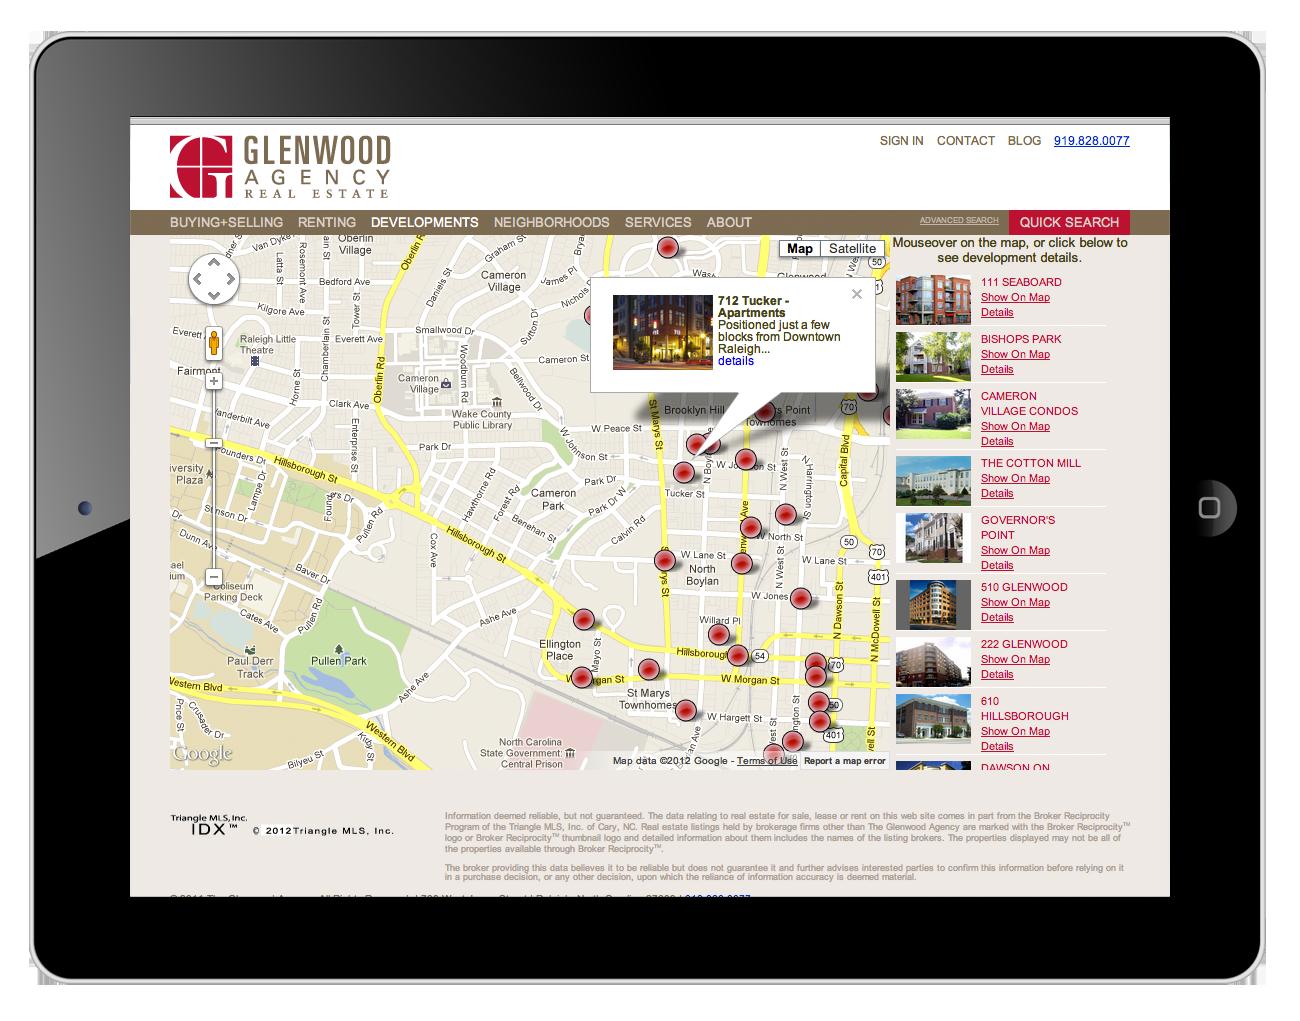 The Glenwood Agency Website